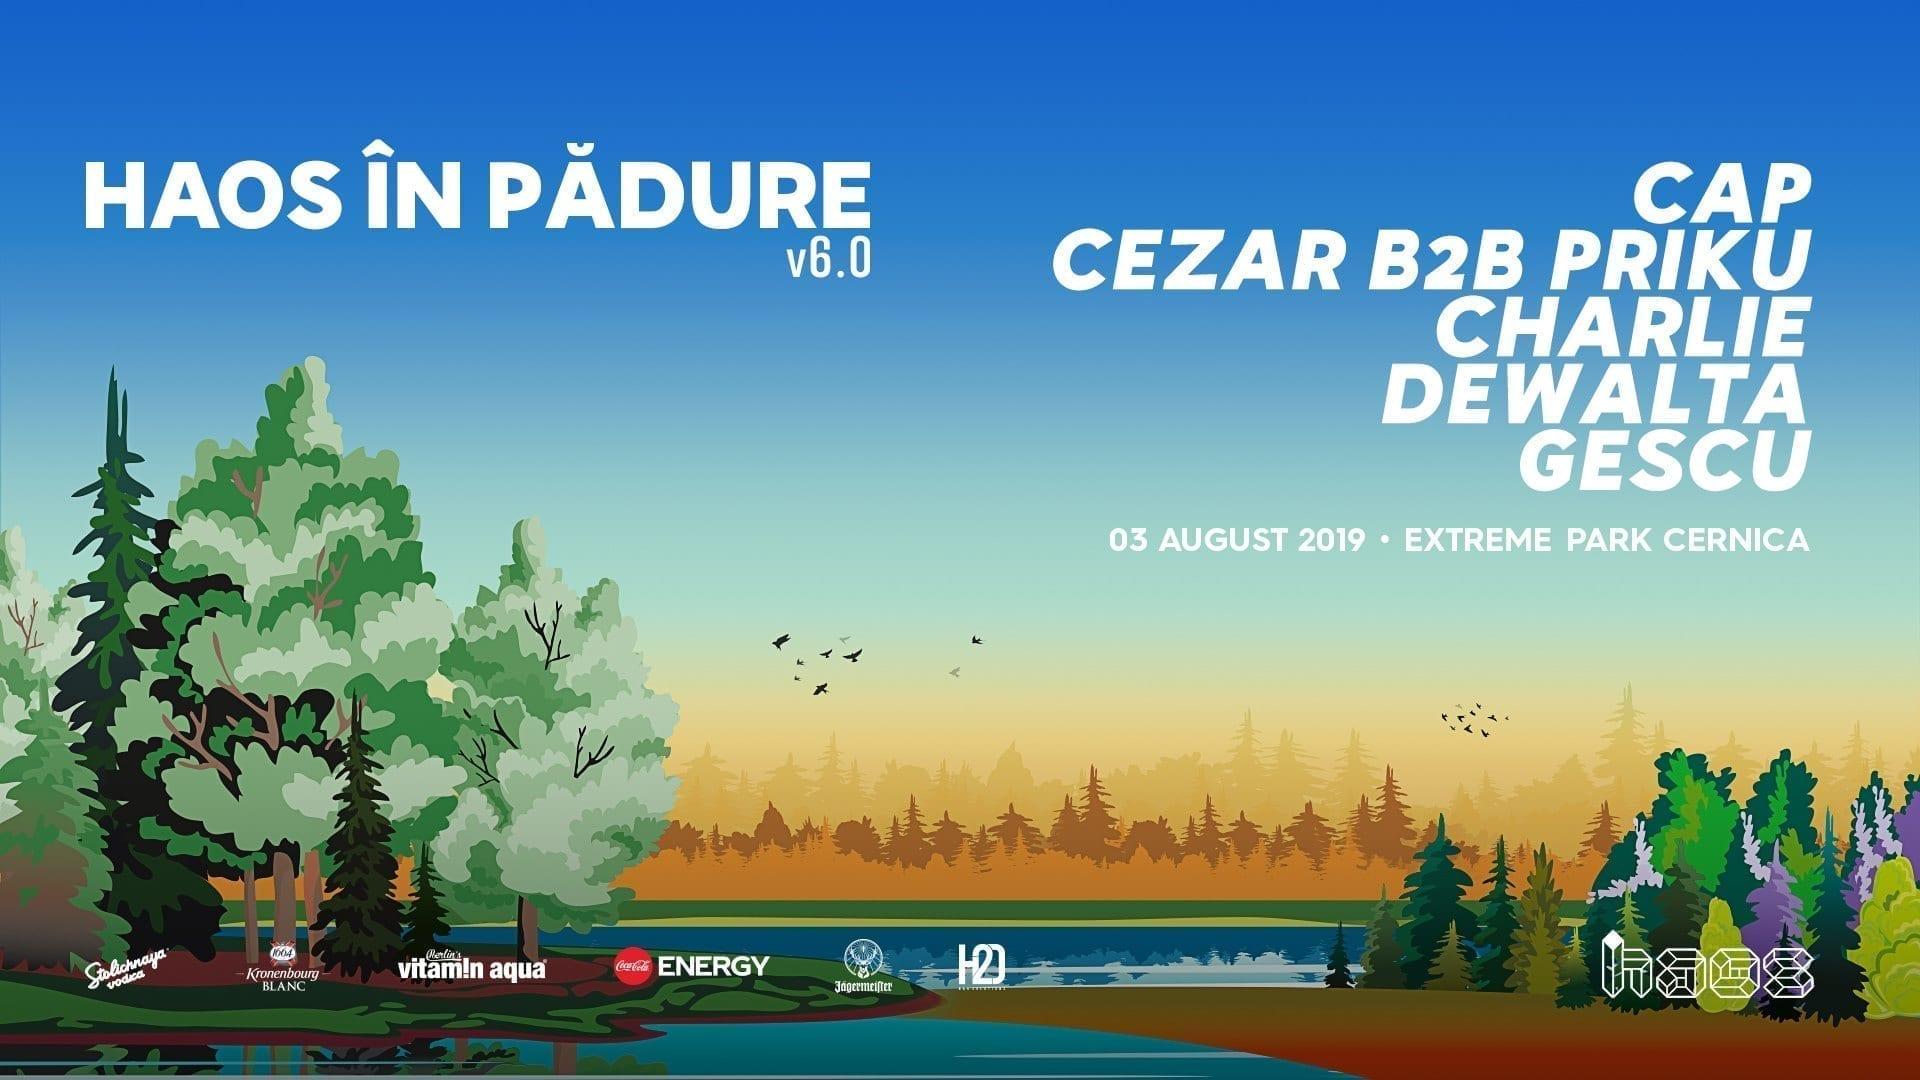 HAOS in Padure v6.0 @ Extreme Park Cernica